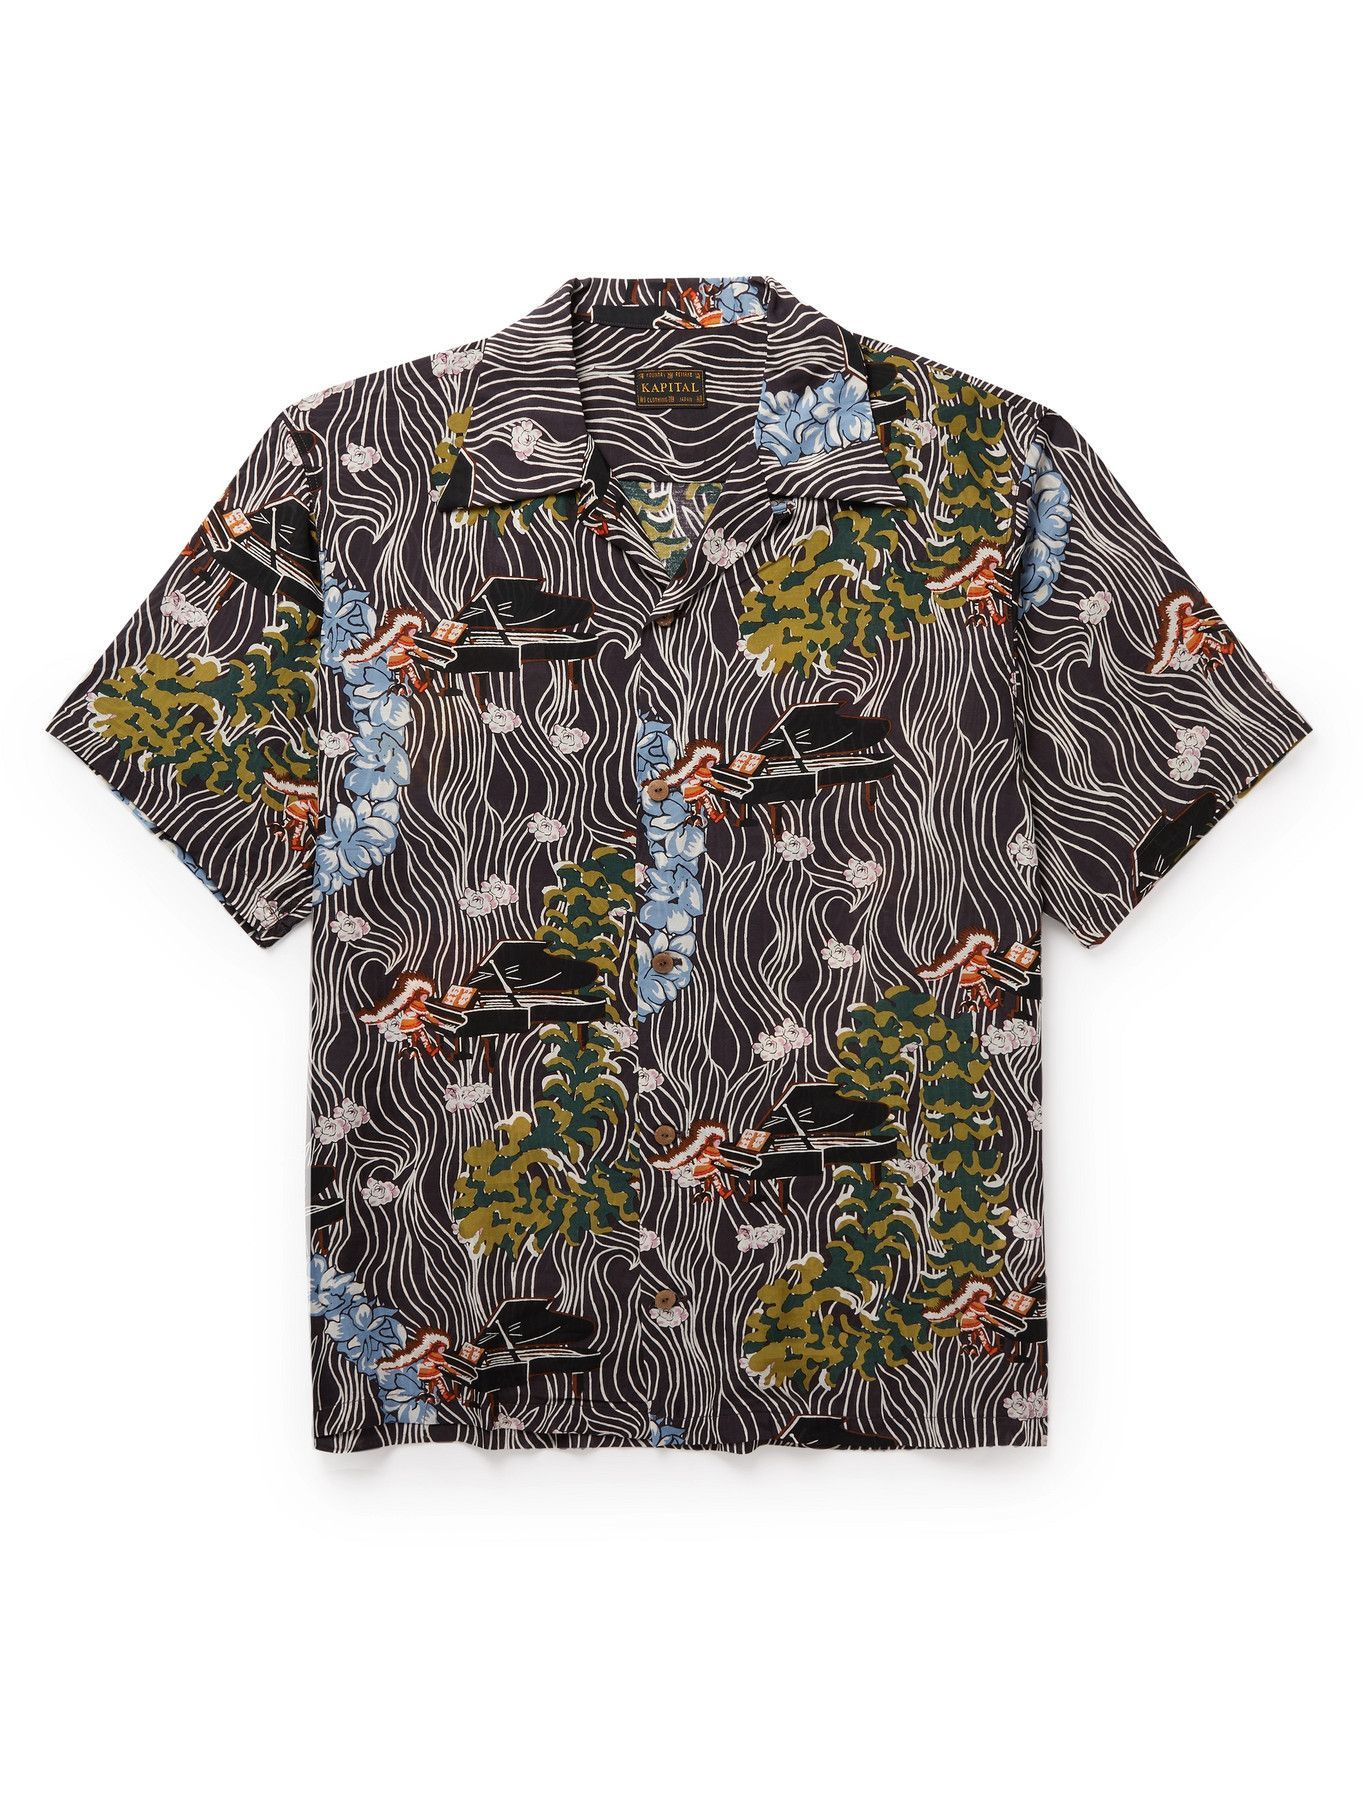 KAPITAL - Convertible-Collar Printed Voile Shirt - Black